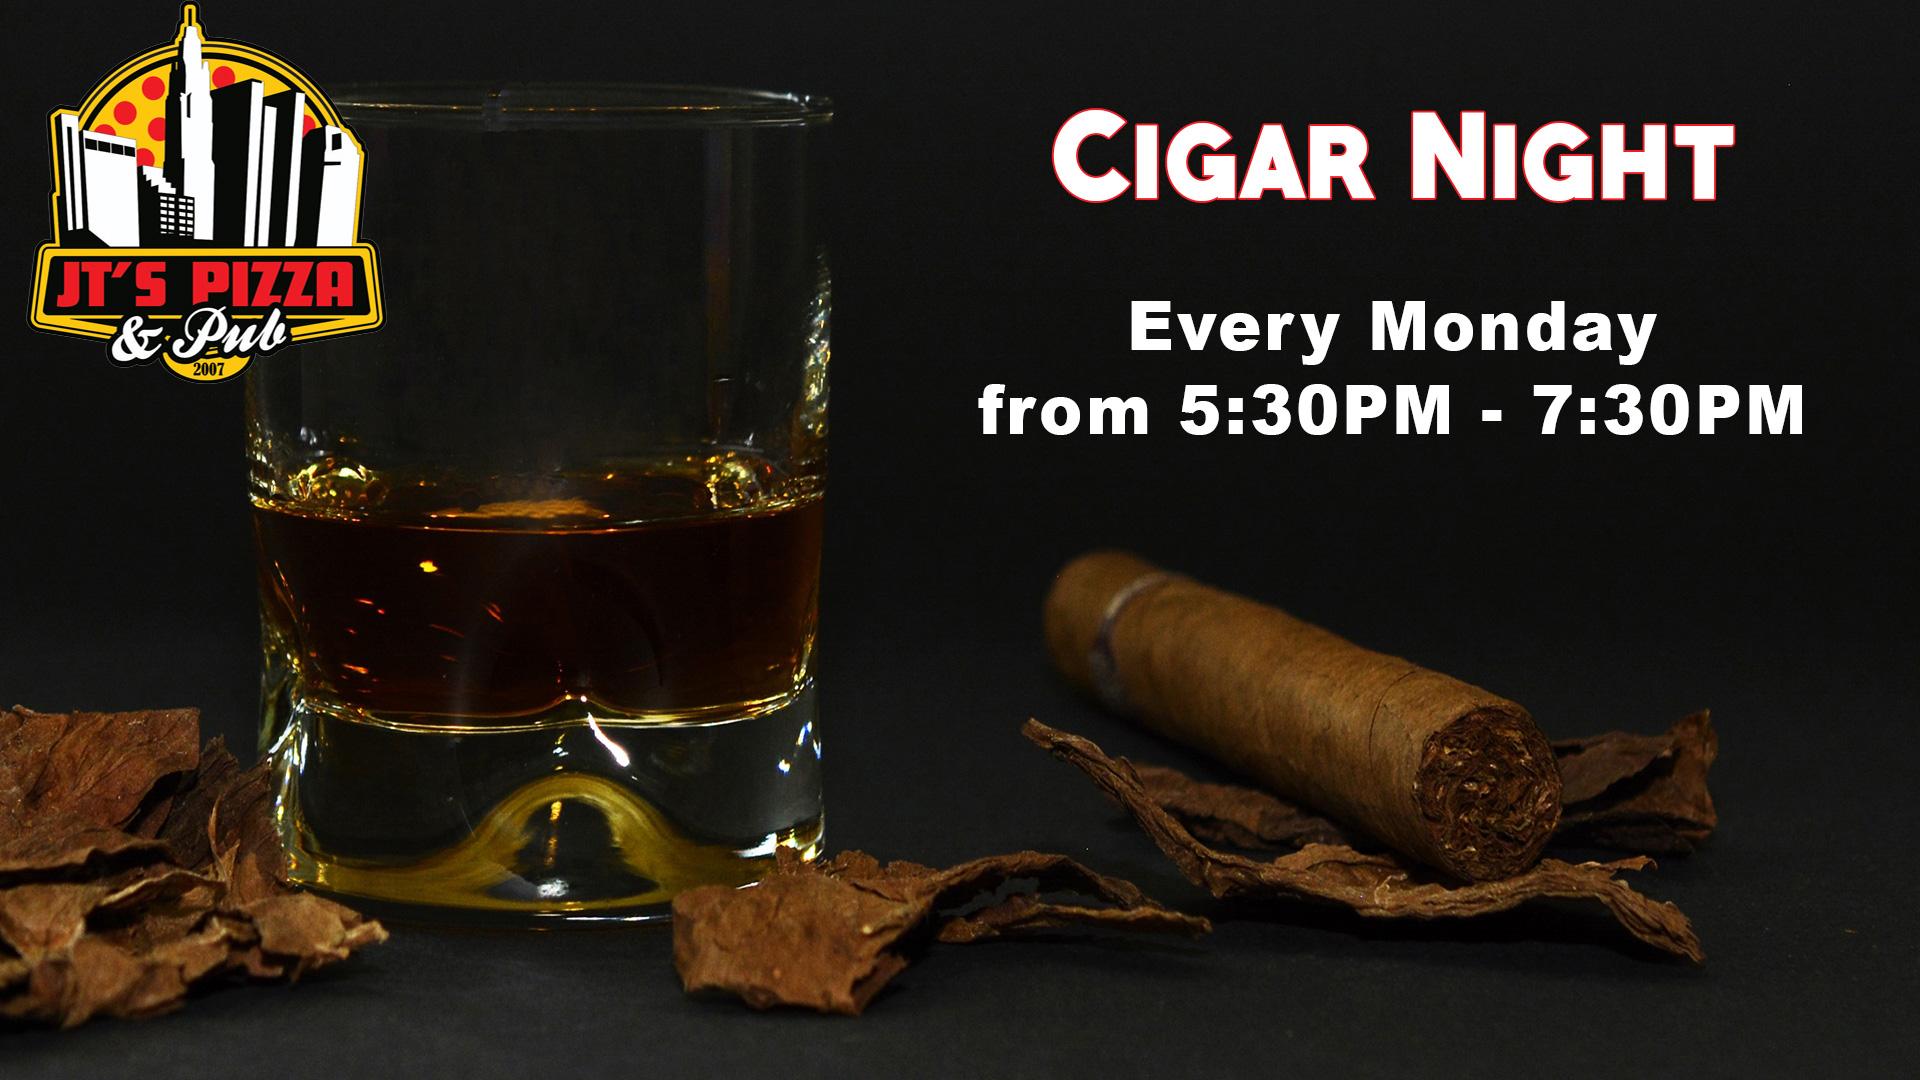 Columbus Cigar Night every Monday at JTs Pizza Columbus!